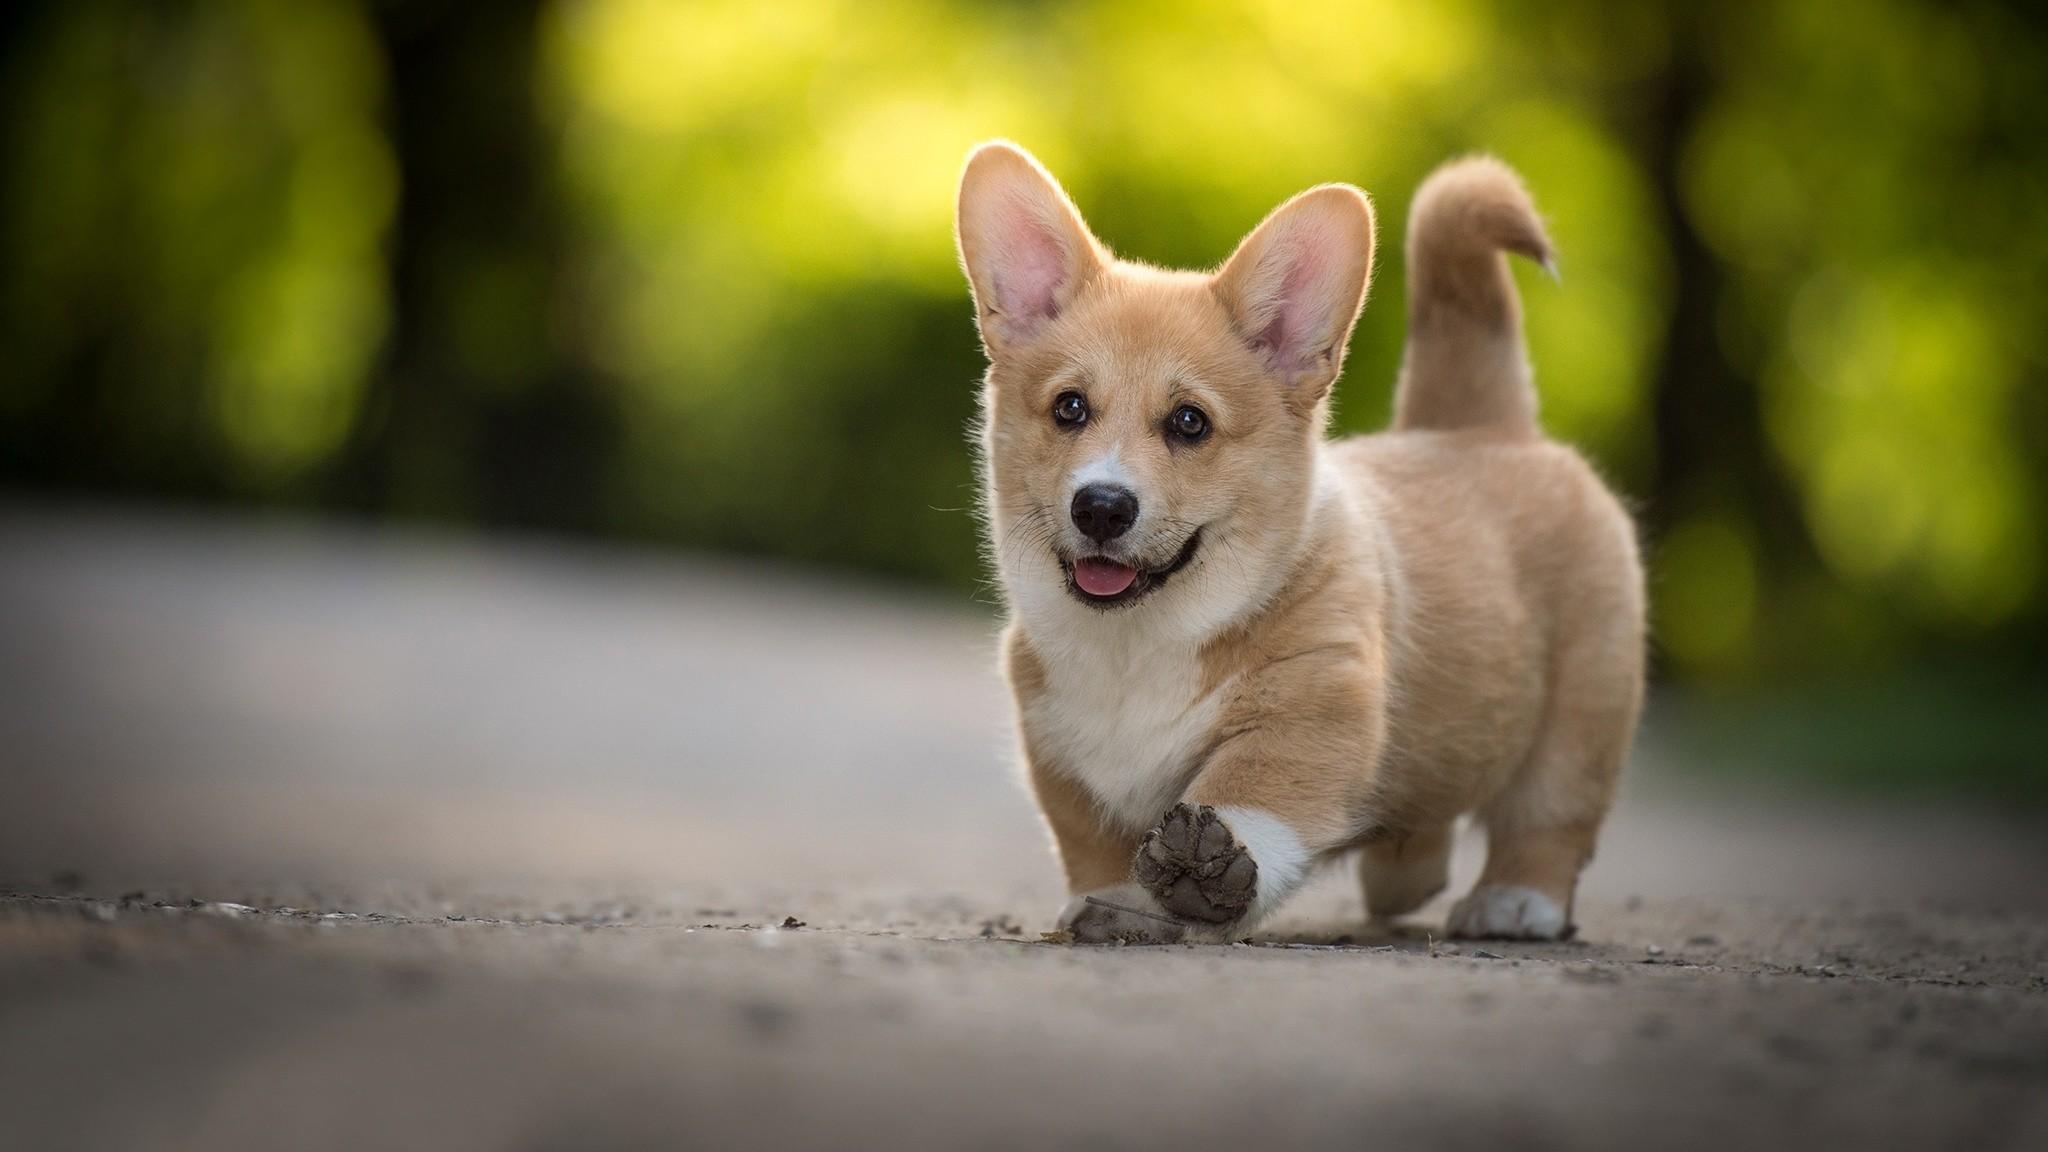 Cute Dogs Full Hd Wallpapers Corgi Puppies Wallpaper 54 Images